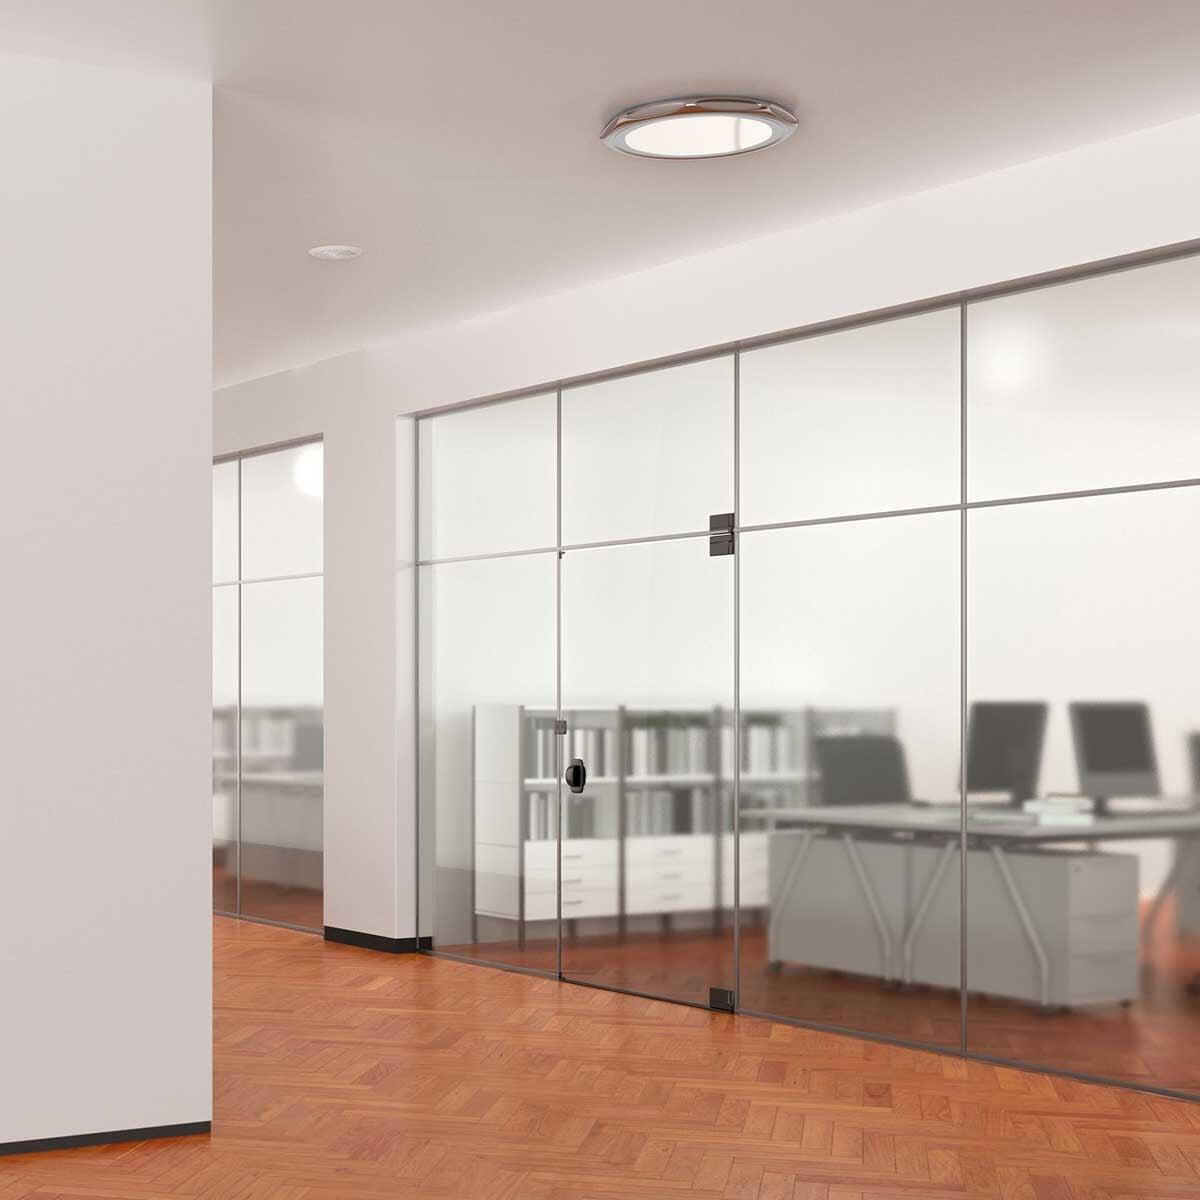 Redesigned office space from Delta Carpet & Decor in Atlanta, GA